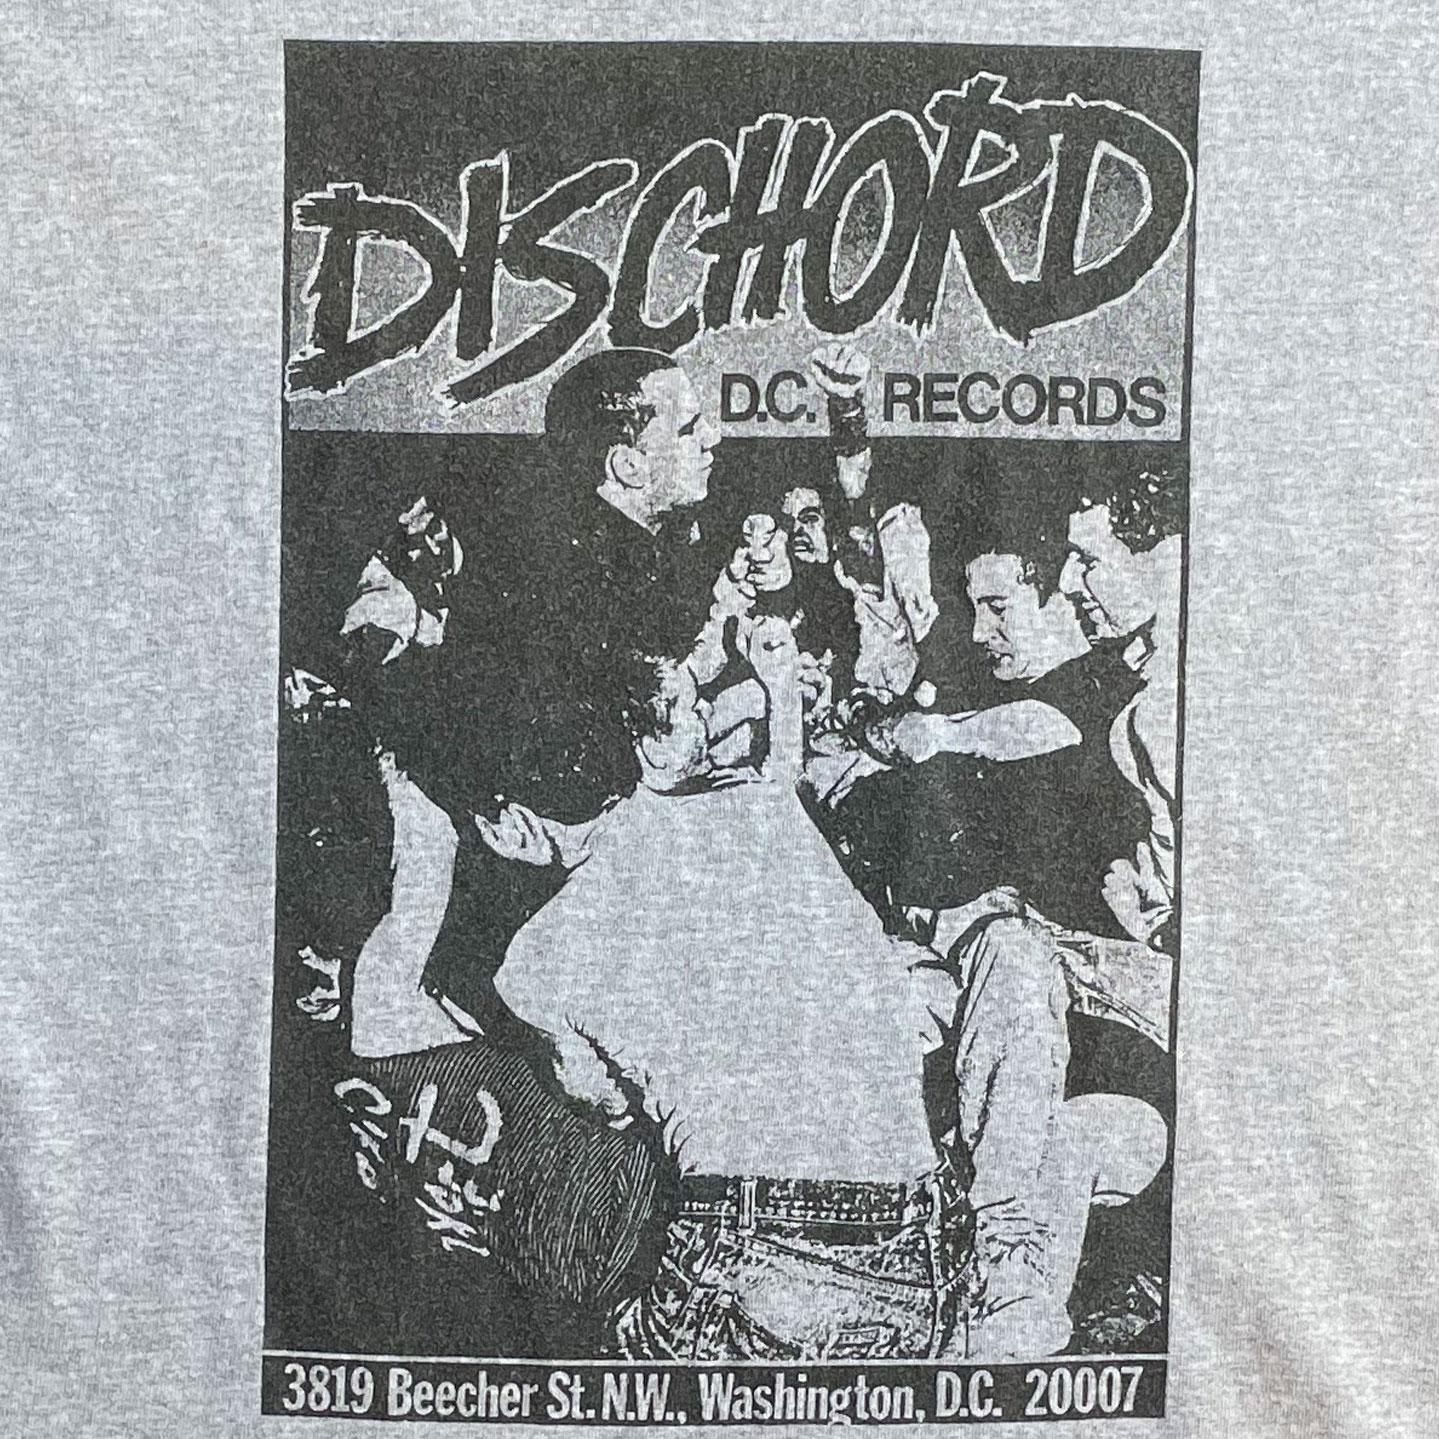 USED! DISCHORD Tシャツ D.C